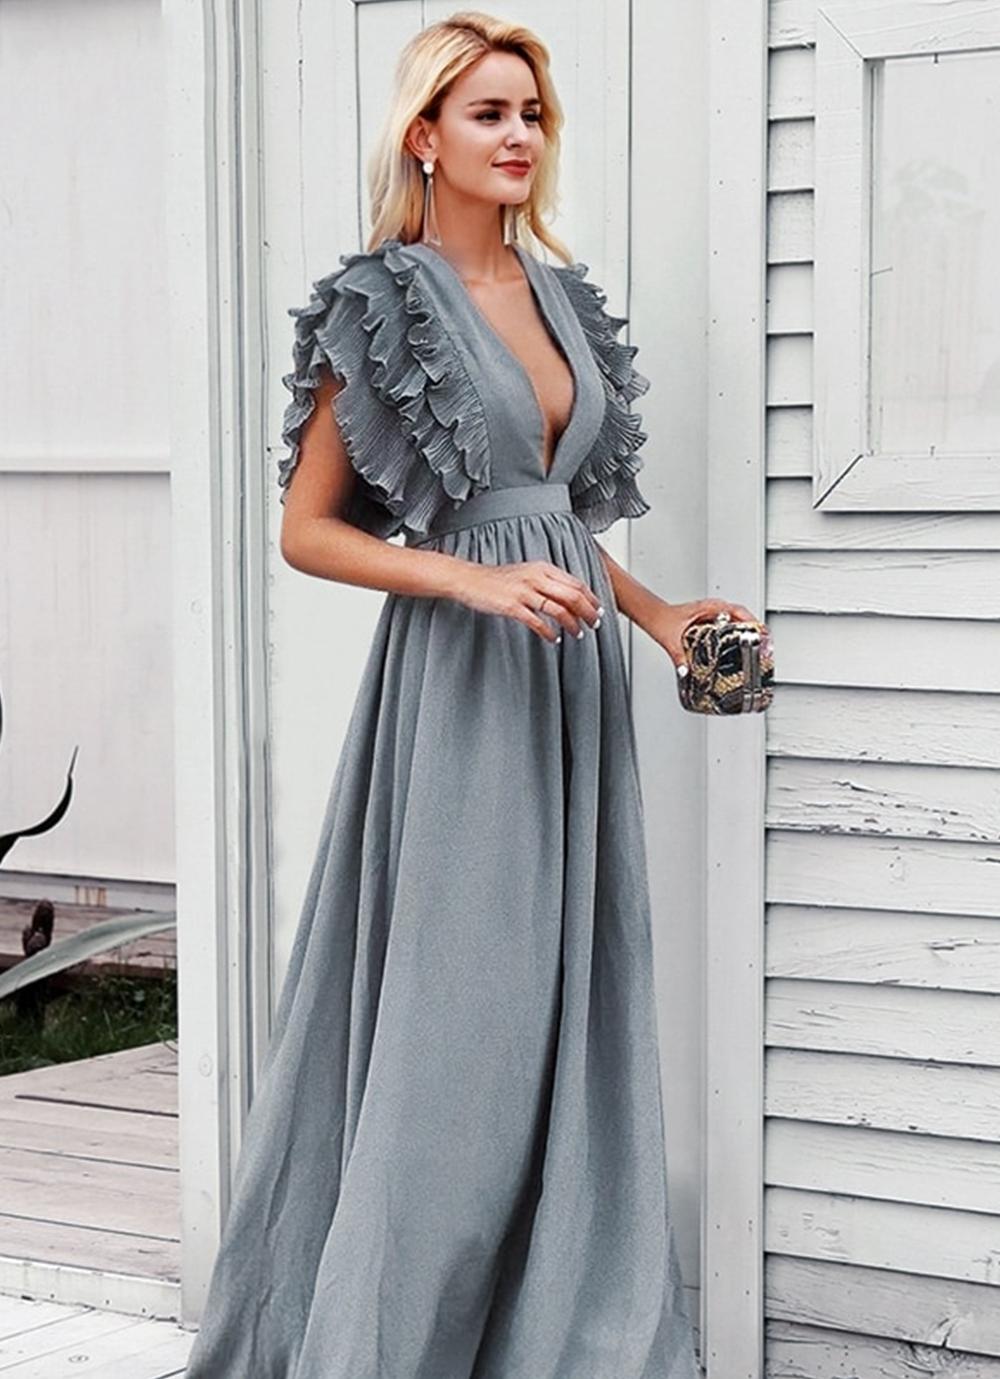 Elegant Ruffle Dress Elegant Ruffle Dress With Deep V Neck Ruffle Sleeves And Long Length Maxi Dress Women Long Dresses Ruffled Maxi Dress